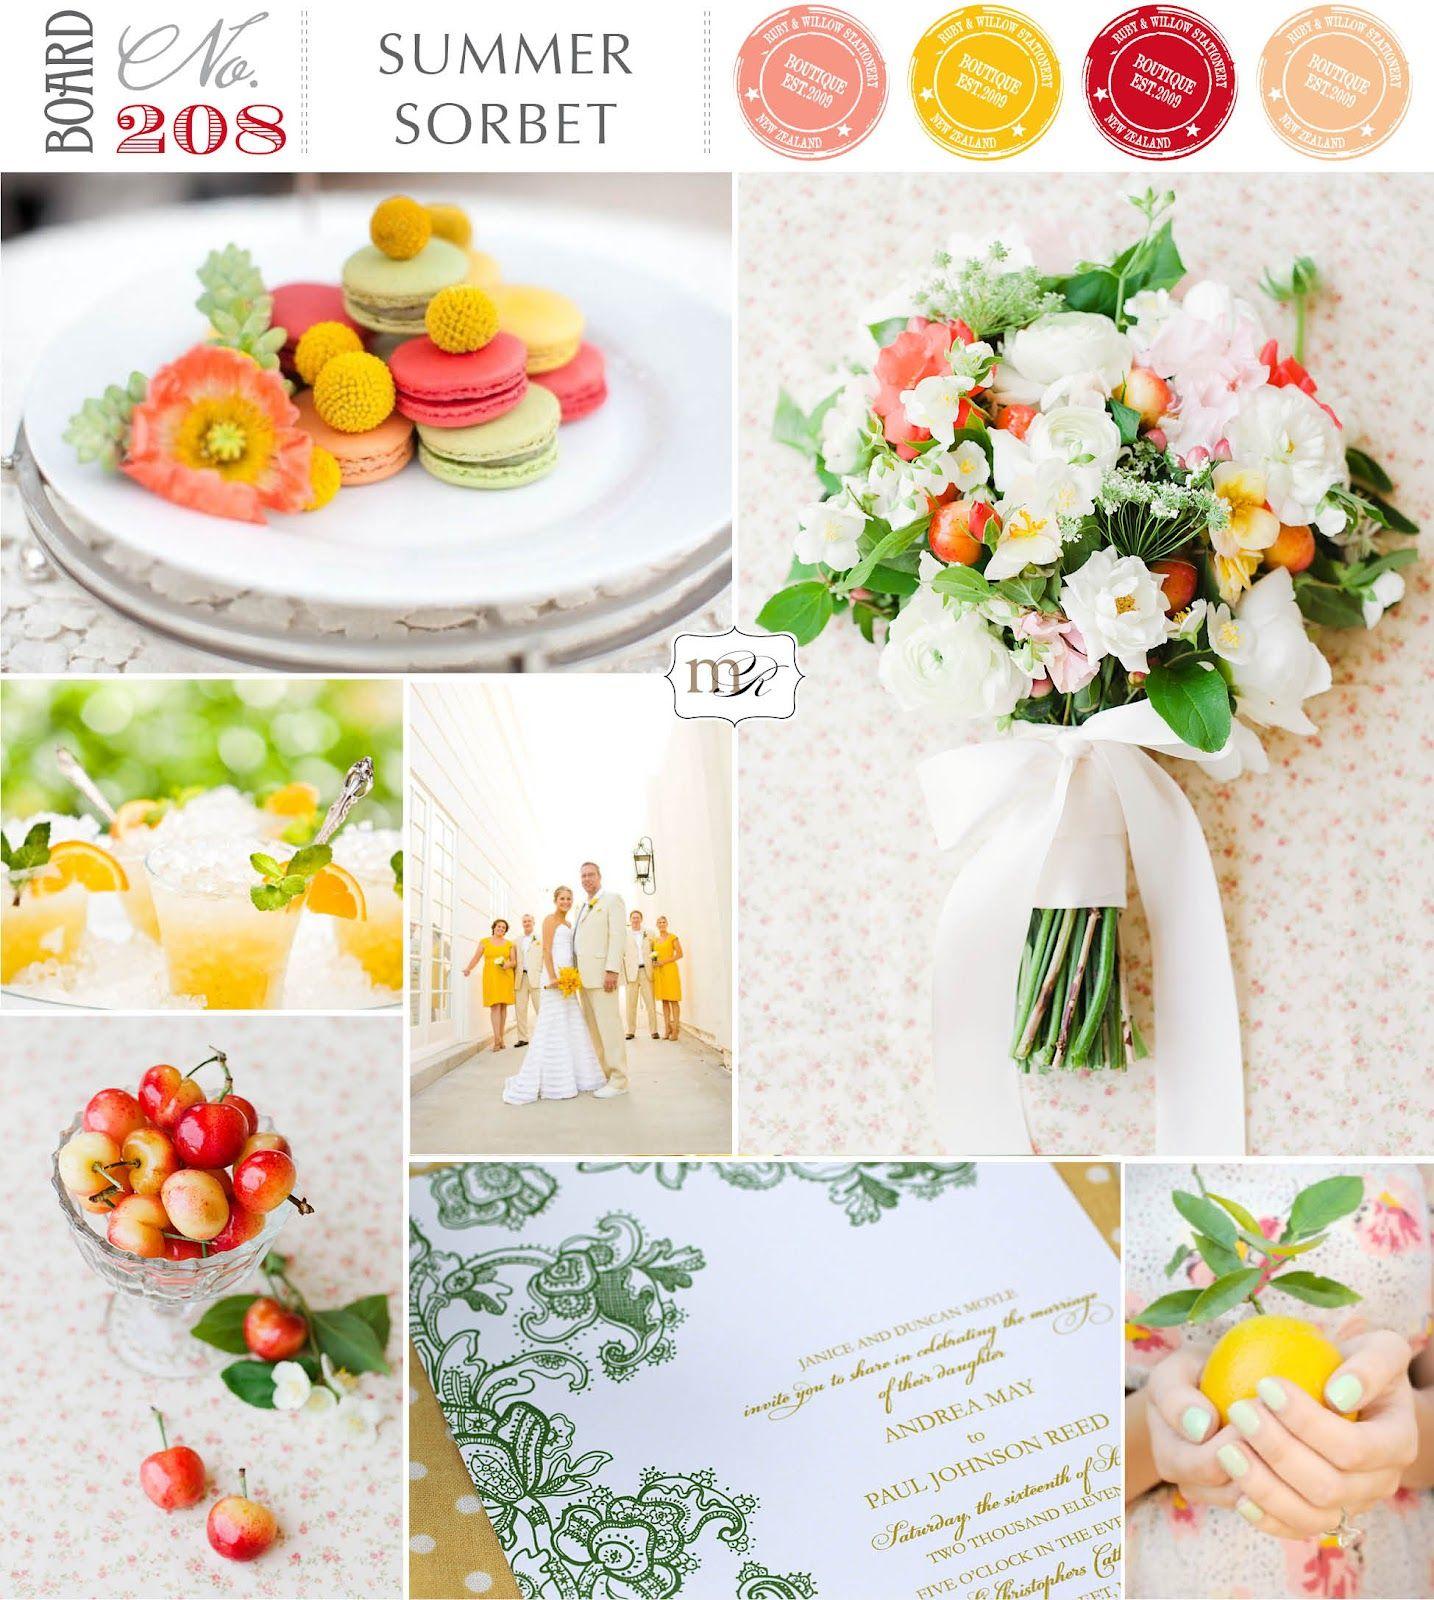 Magnolia Rouge Wedding Inspiration Board #208: Summer Sorbet